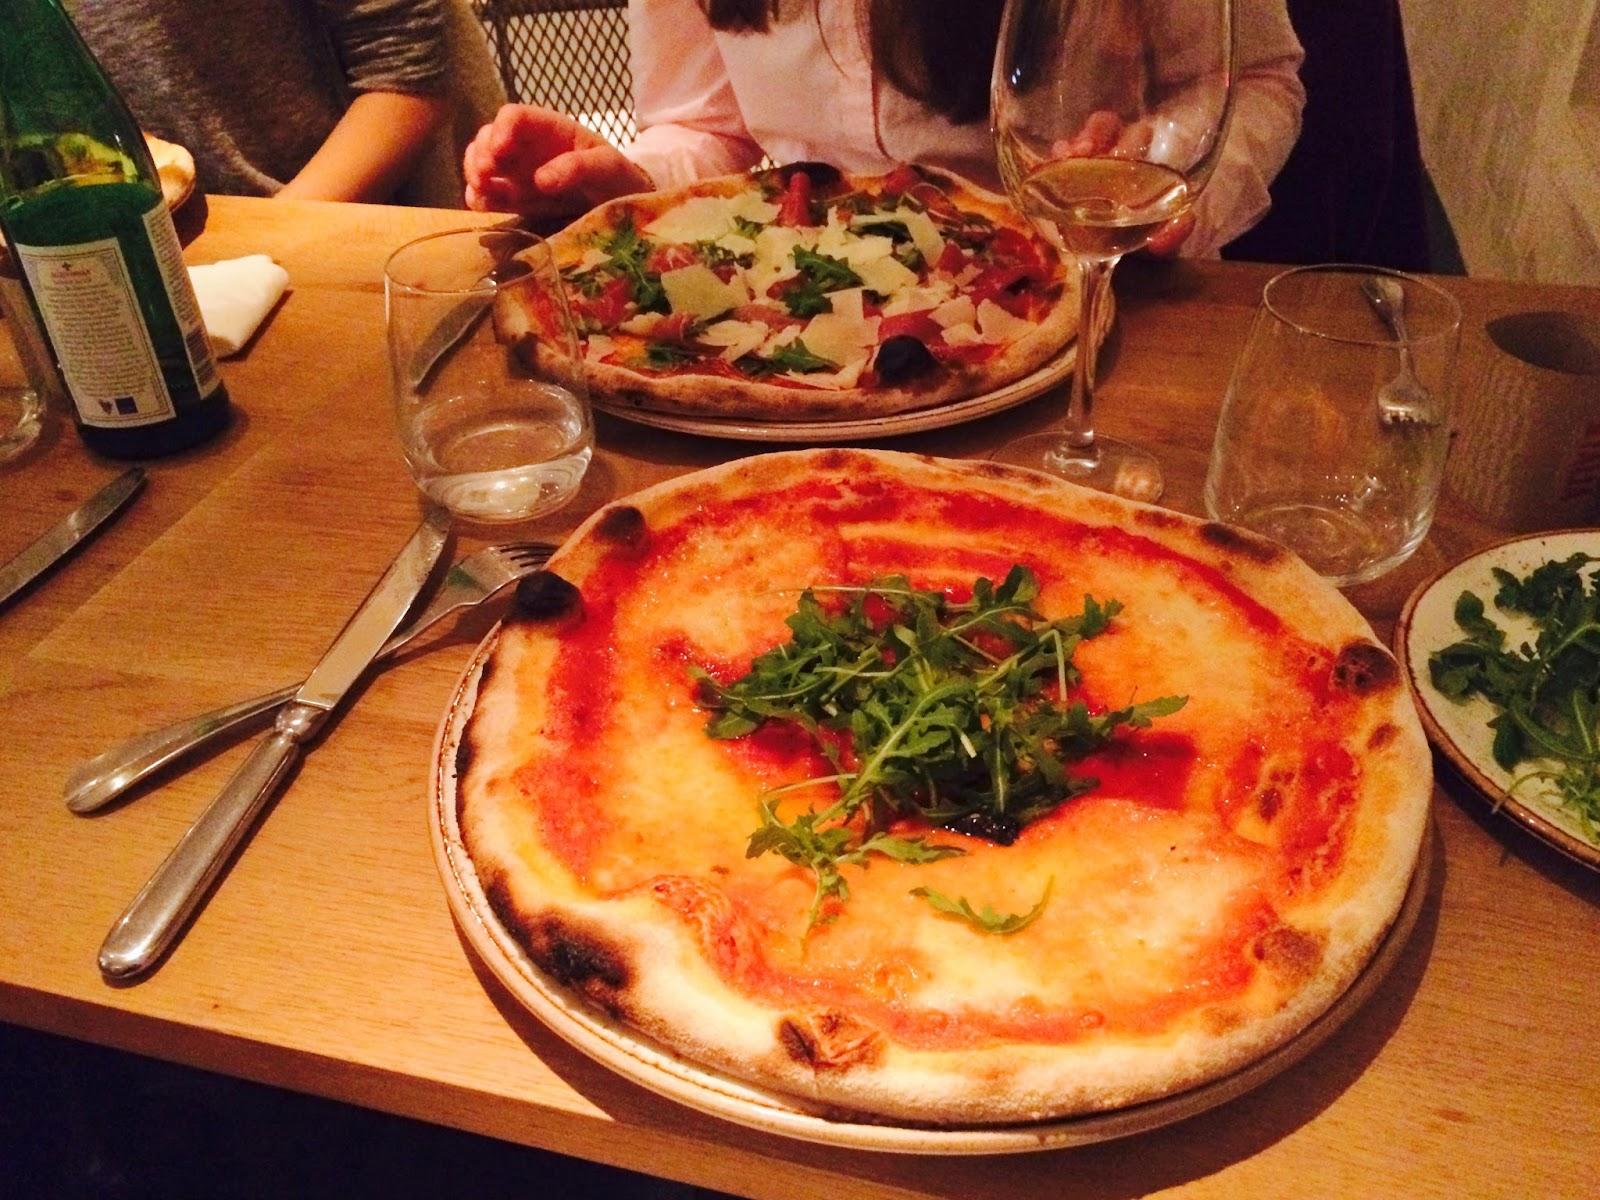 Pizza in Antwerp - Bar Italia